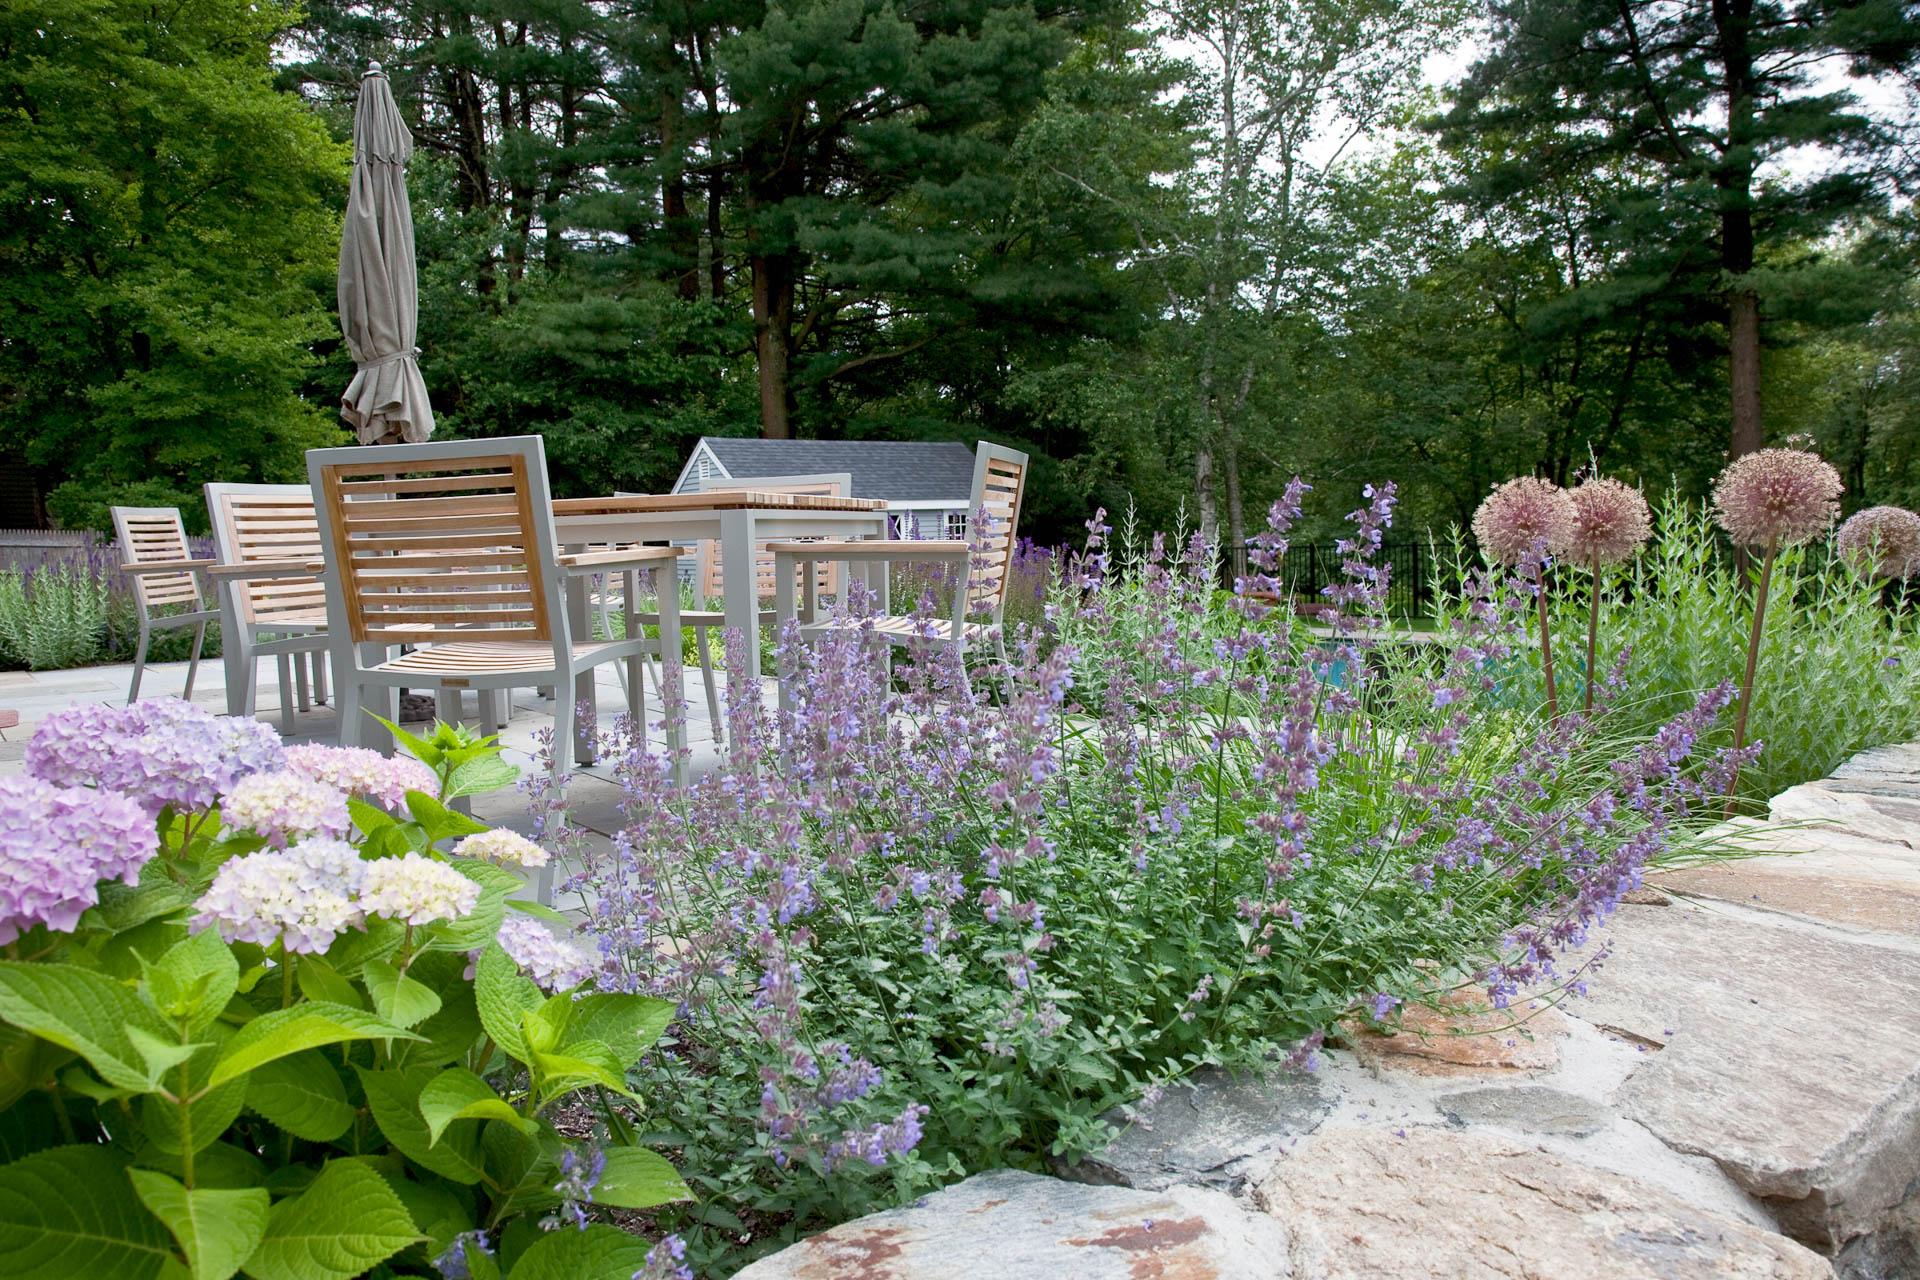 Charles river garden matthew cunningham landscape design llc for Garden design llc